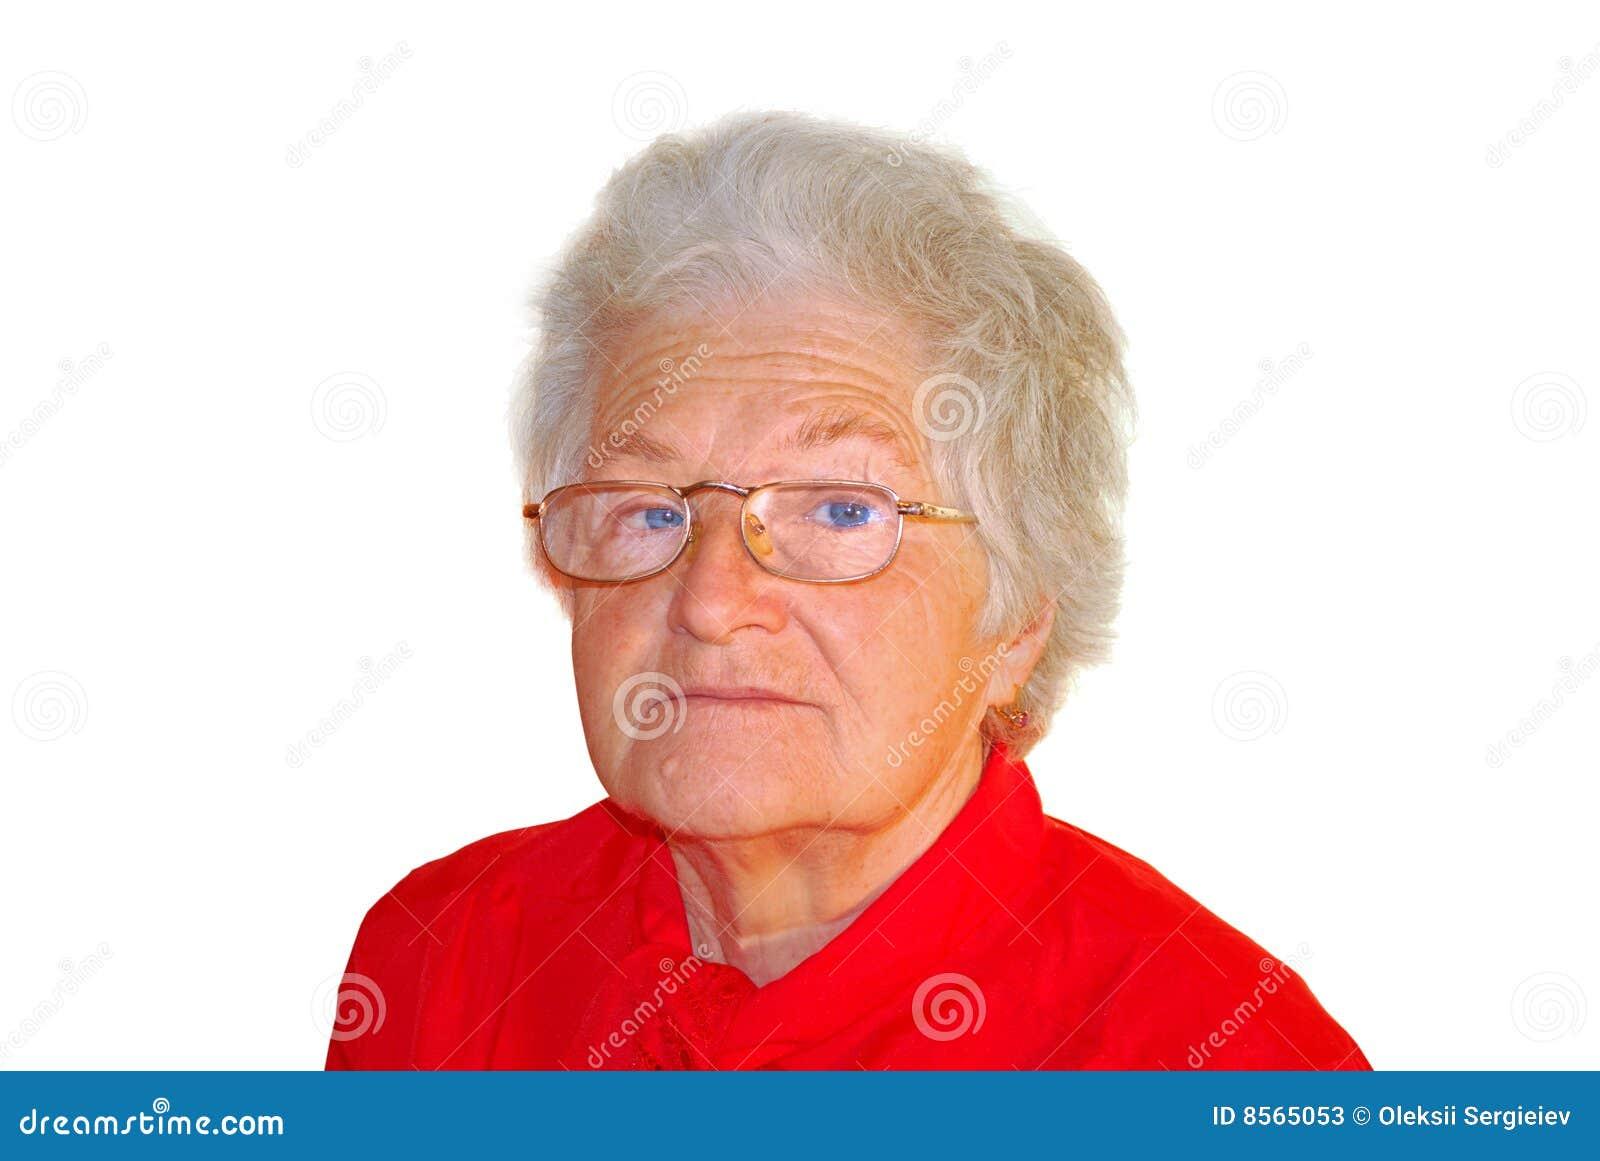 Stock Photos: A portrait of elderly woman